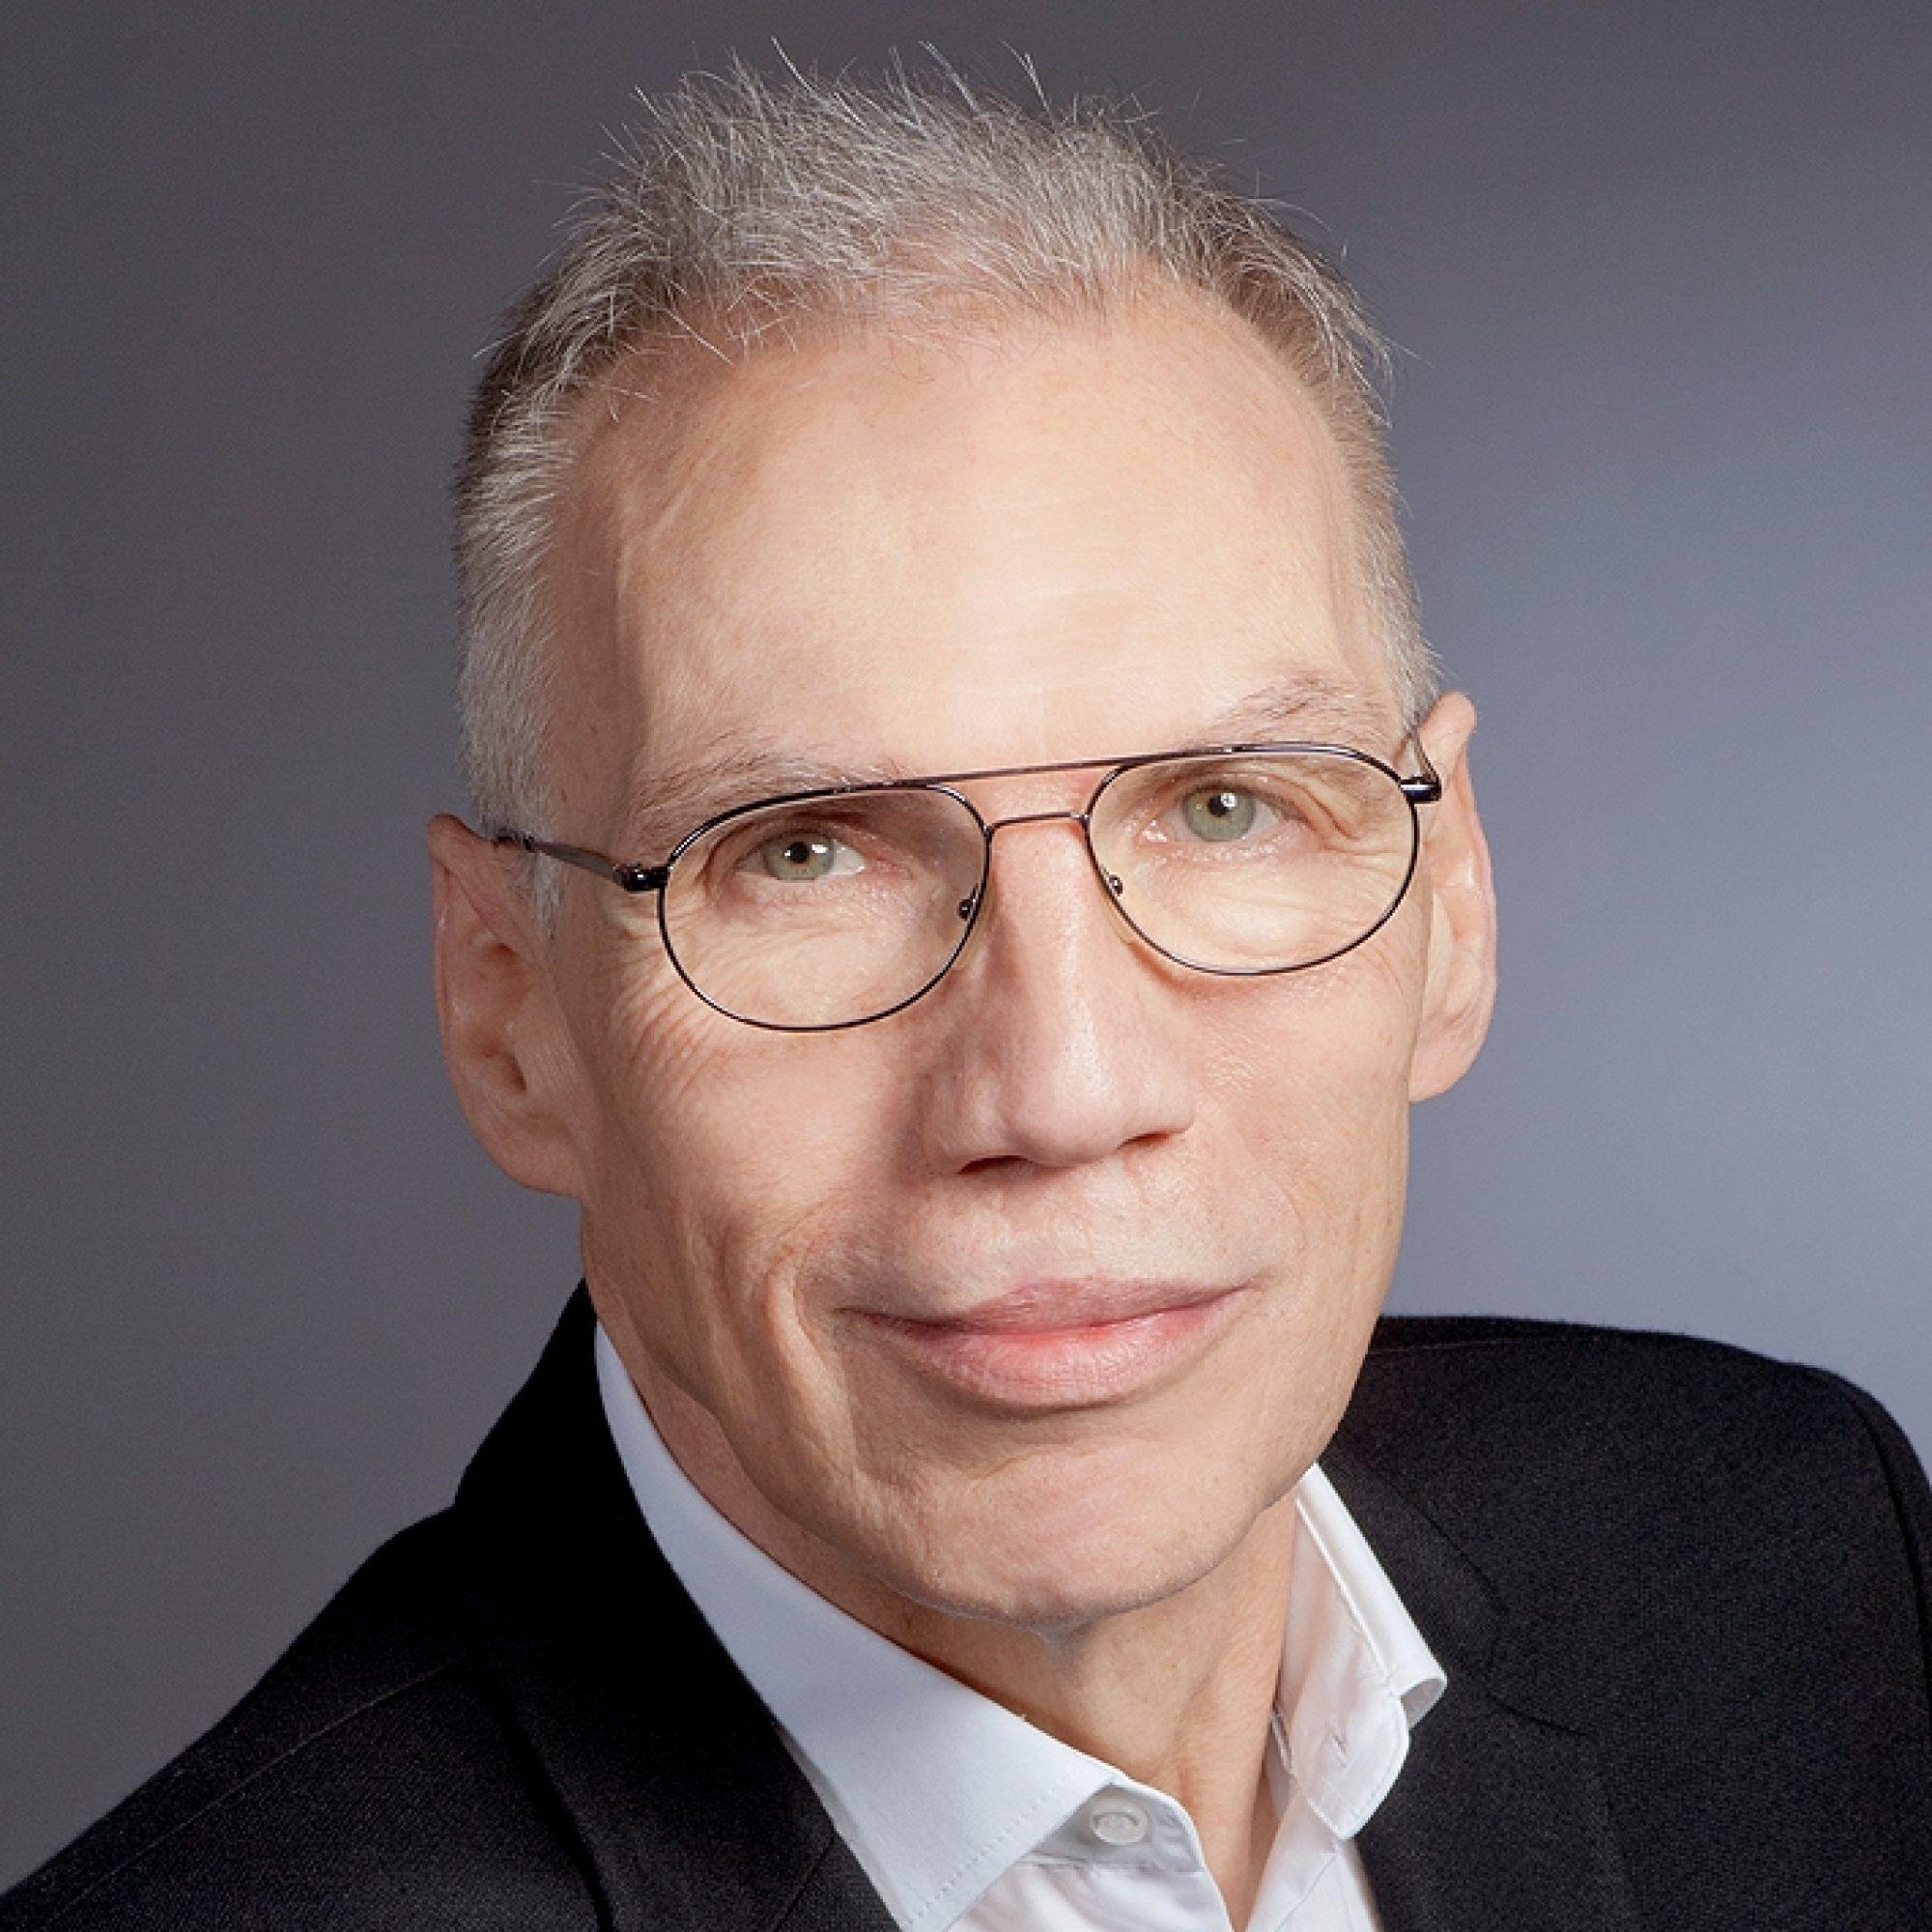 Bernd Lengelsen